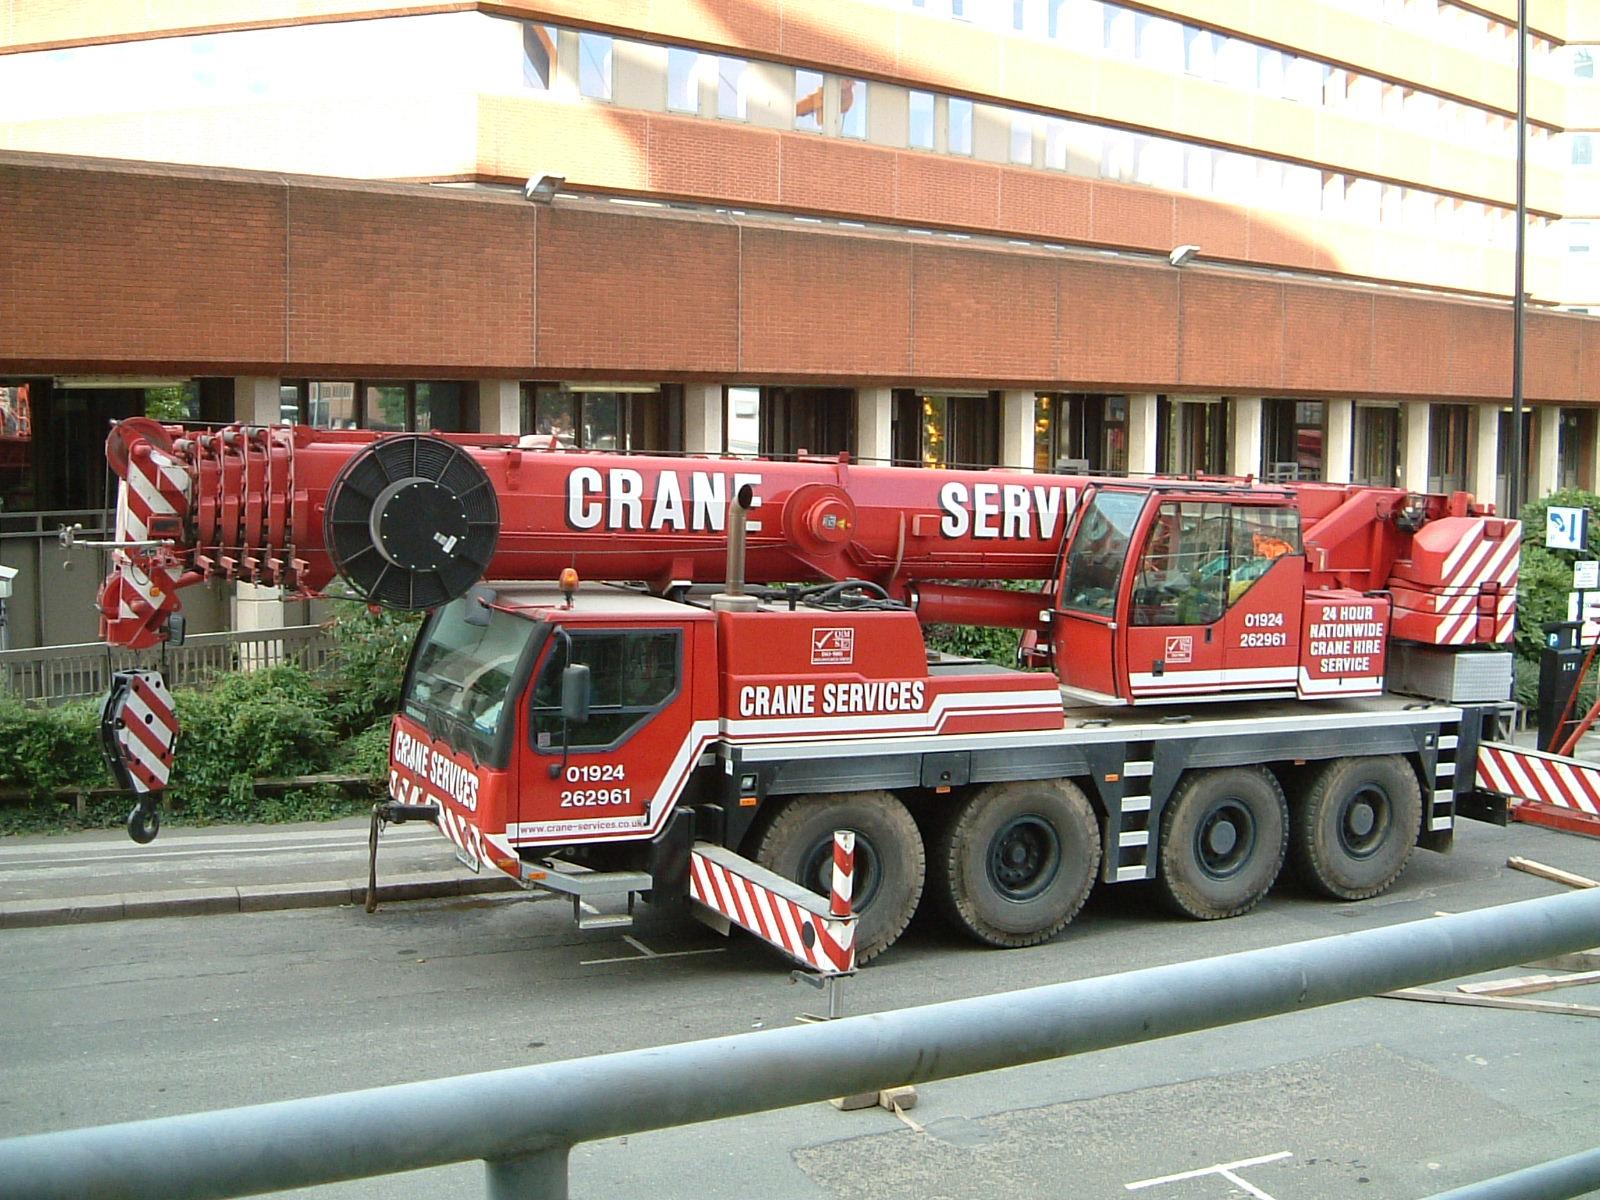 Crane   Tractor & Construction Plant Wiki   FANDOM powered by Wikia